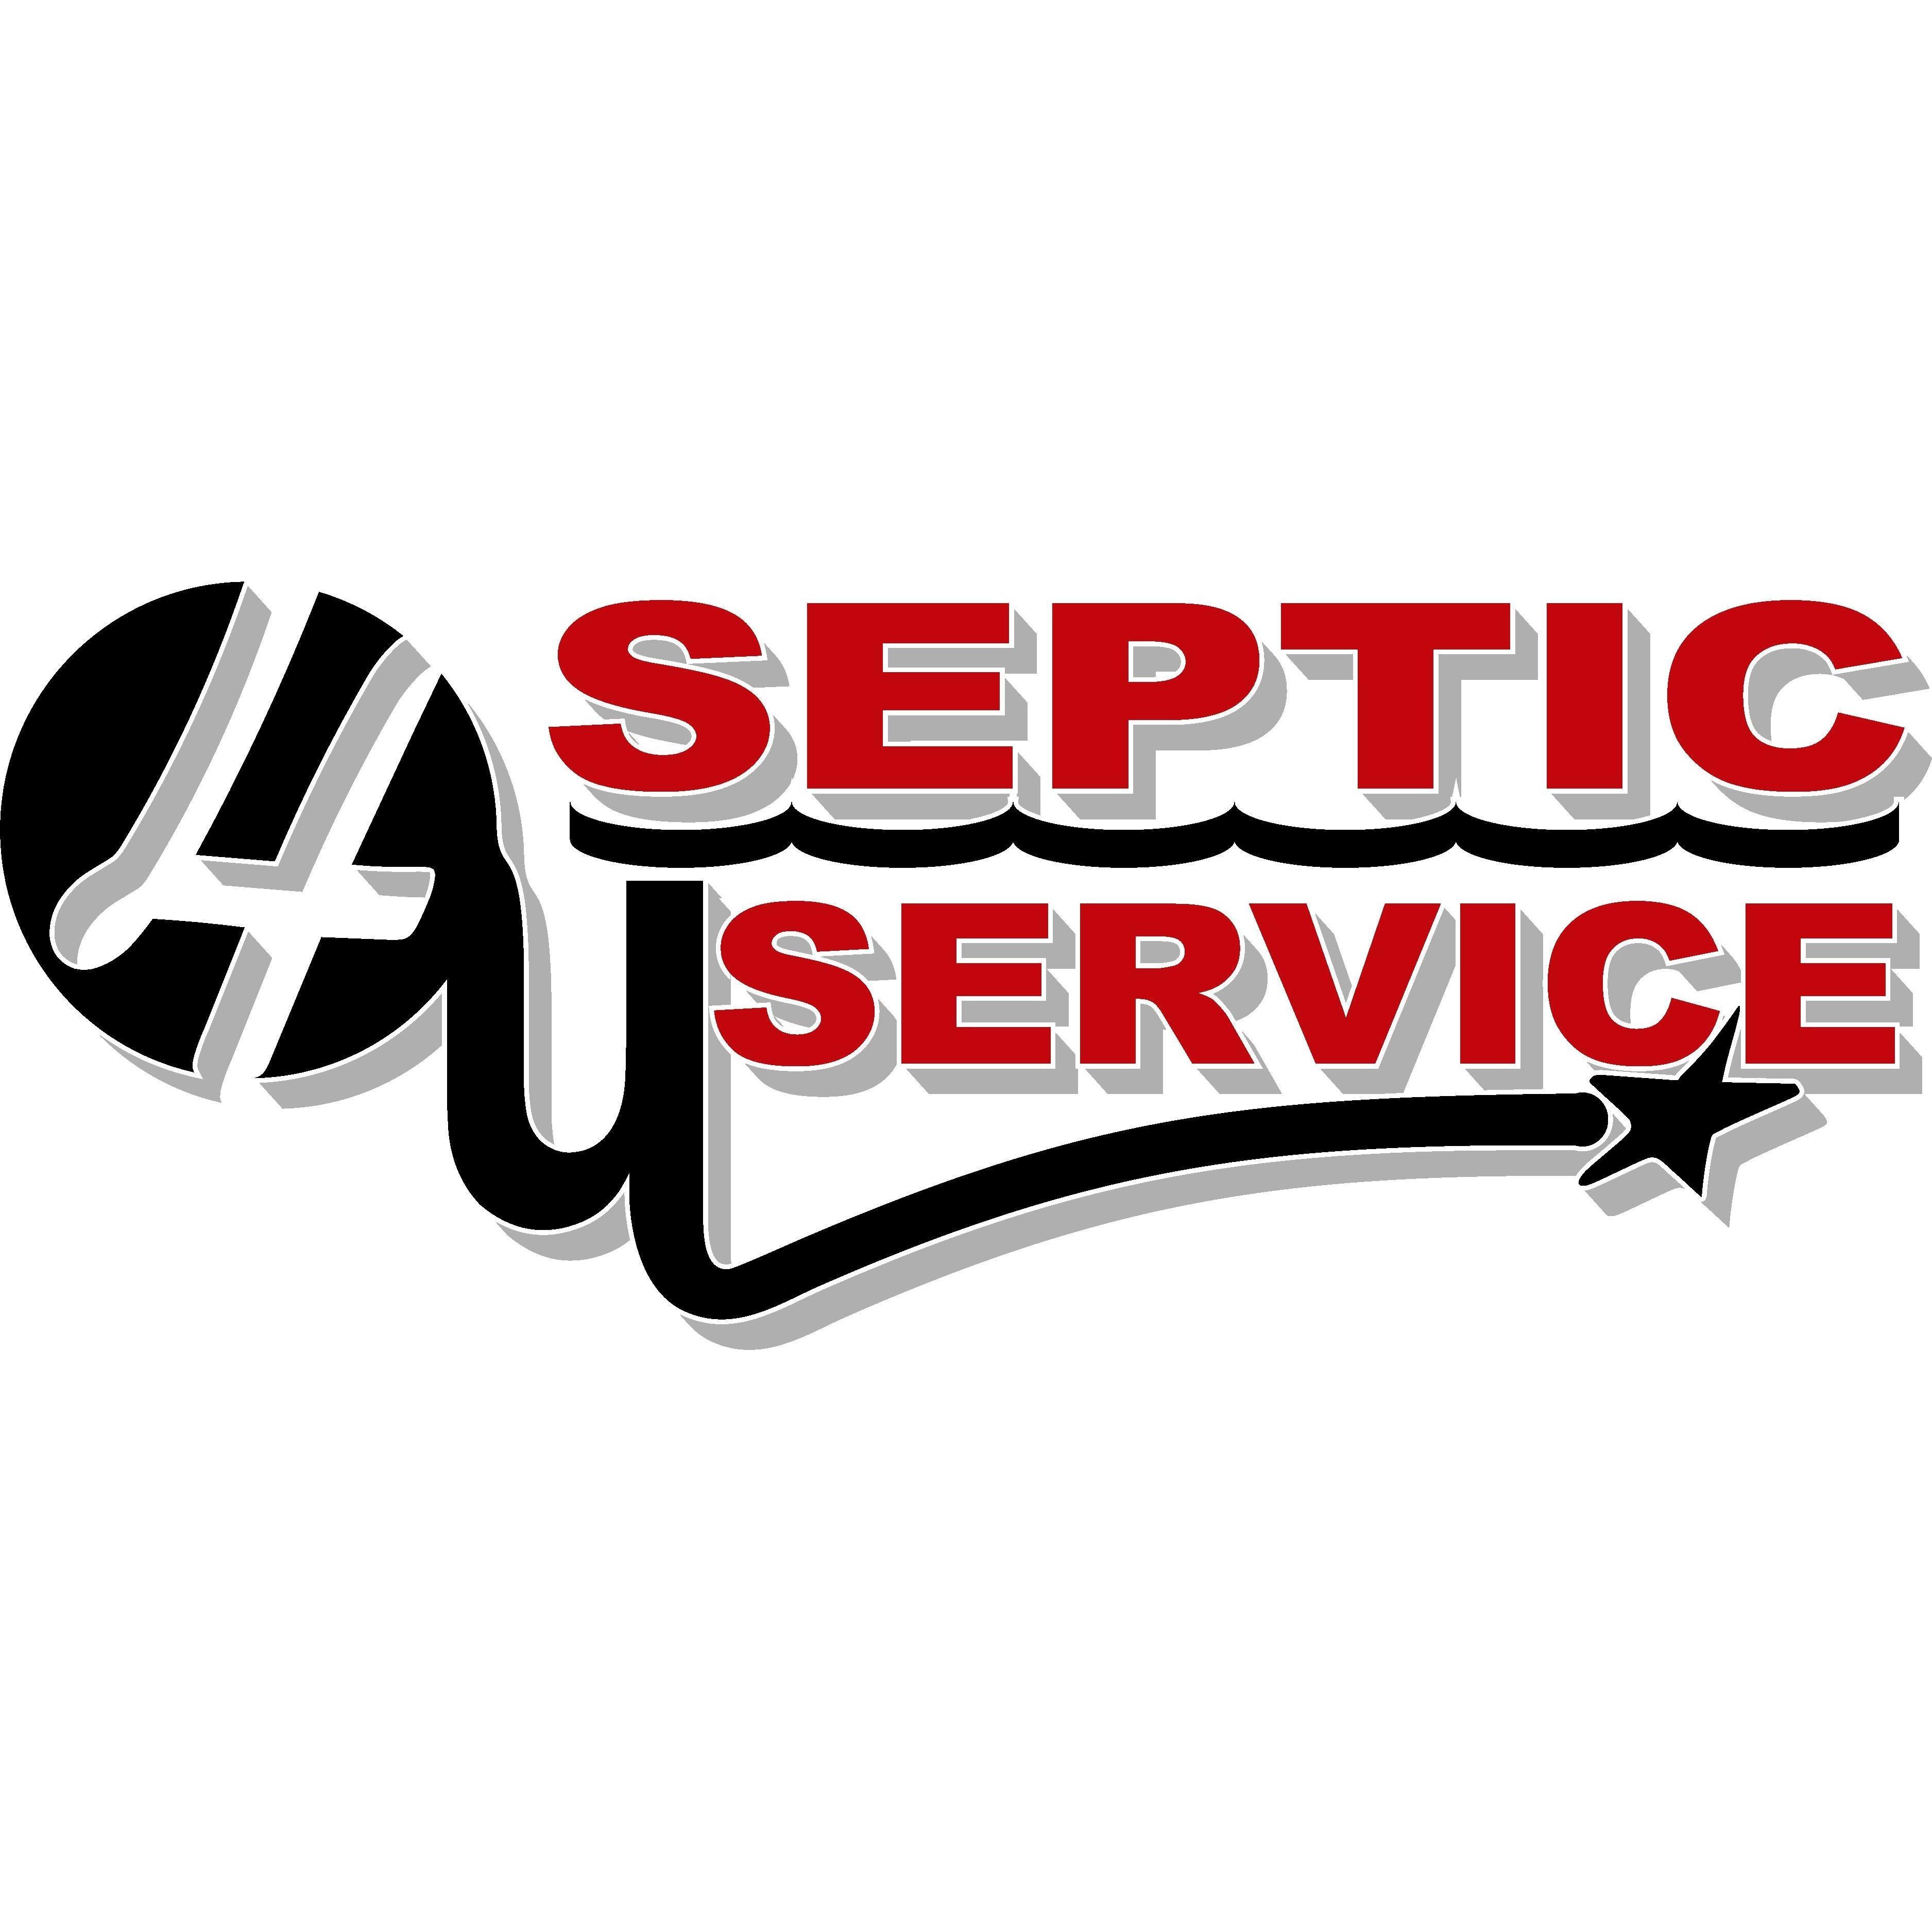 4-U Septic Service - Minot, ND - Septic Tank Cleaning & Repair